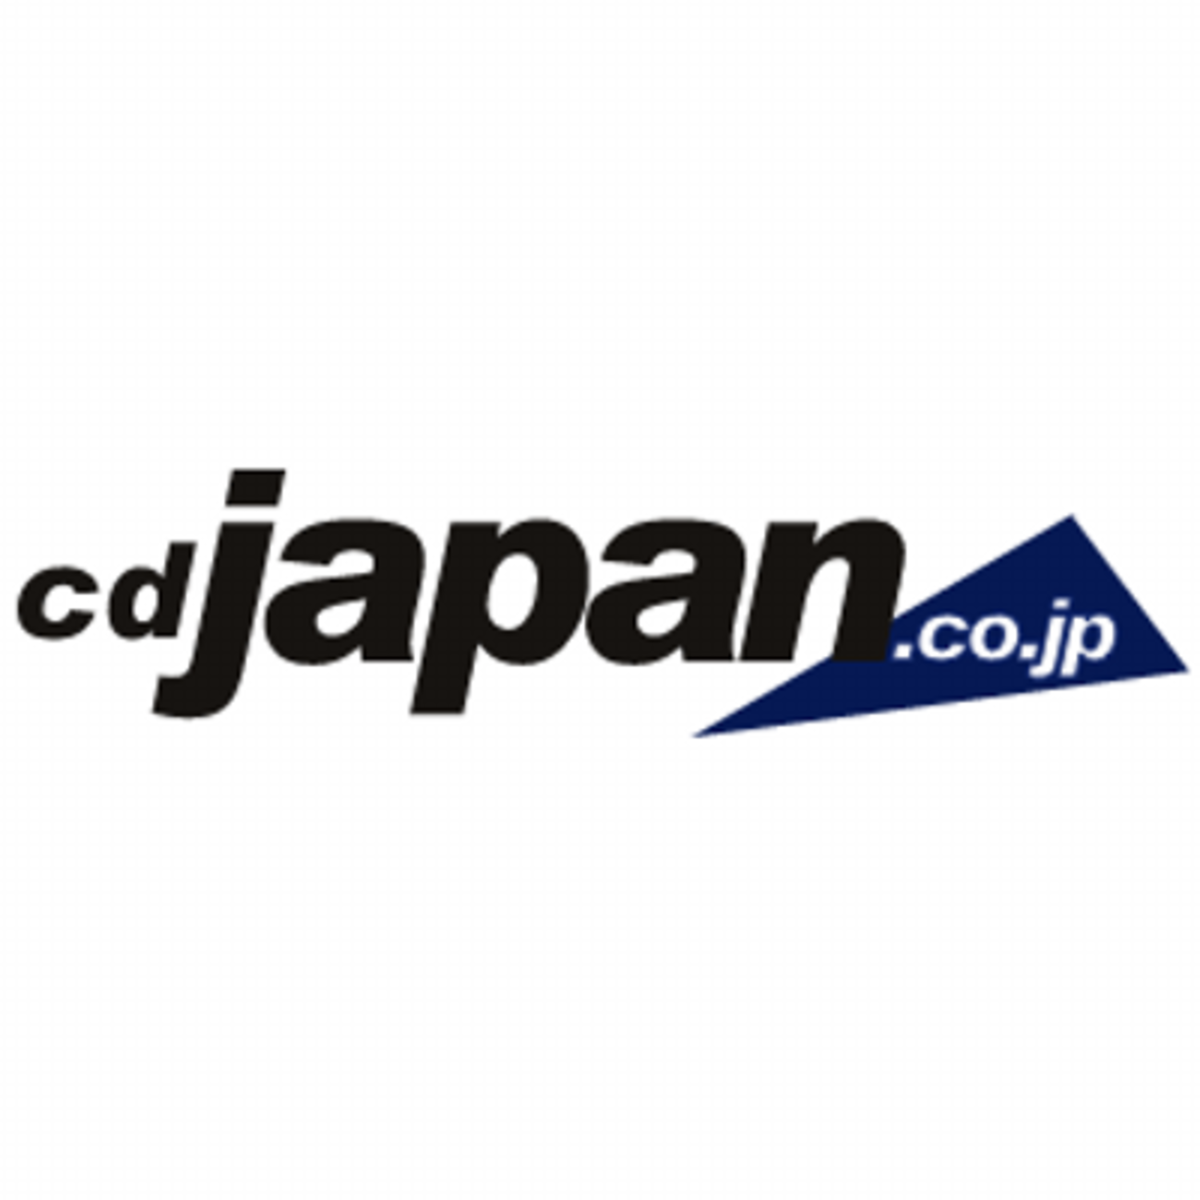 Website Review: CDJapan.co.jp